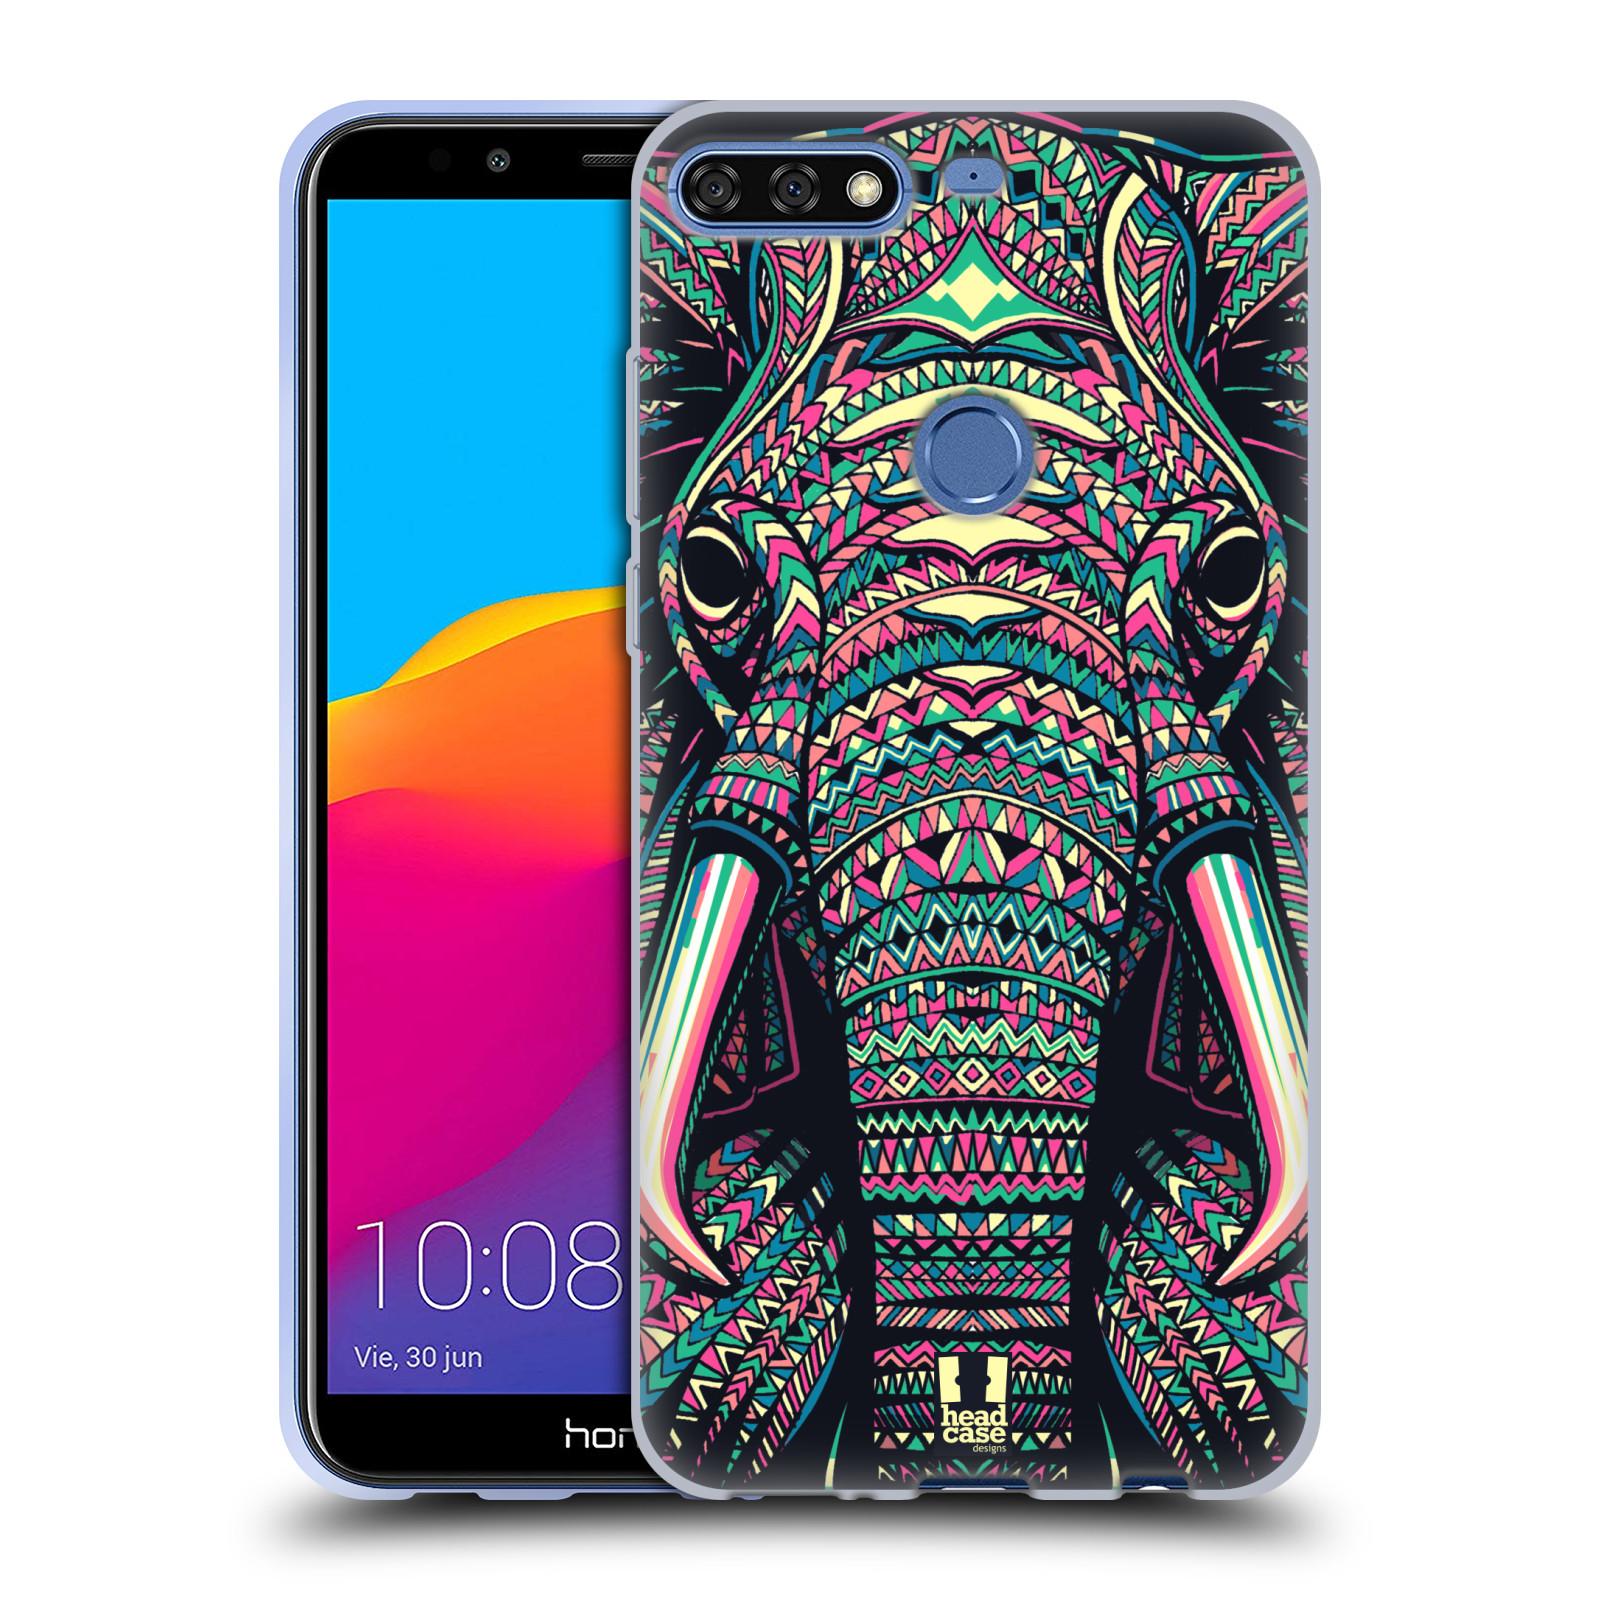 Silikonové pouzdro na mobil Honor 7C - Head Case - AZTEC SLON